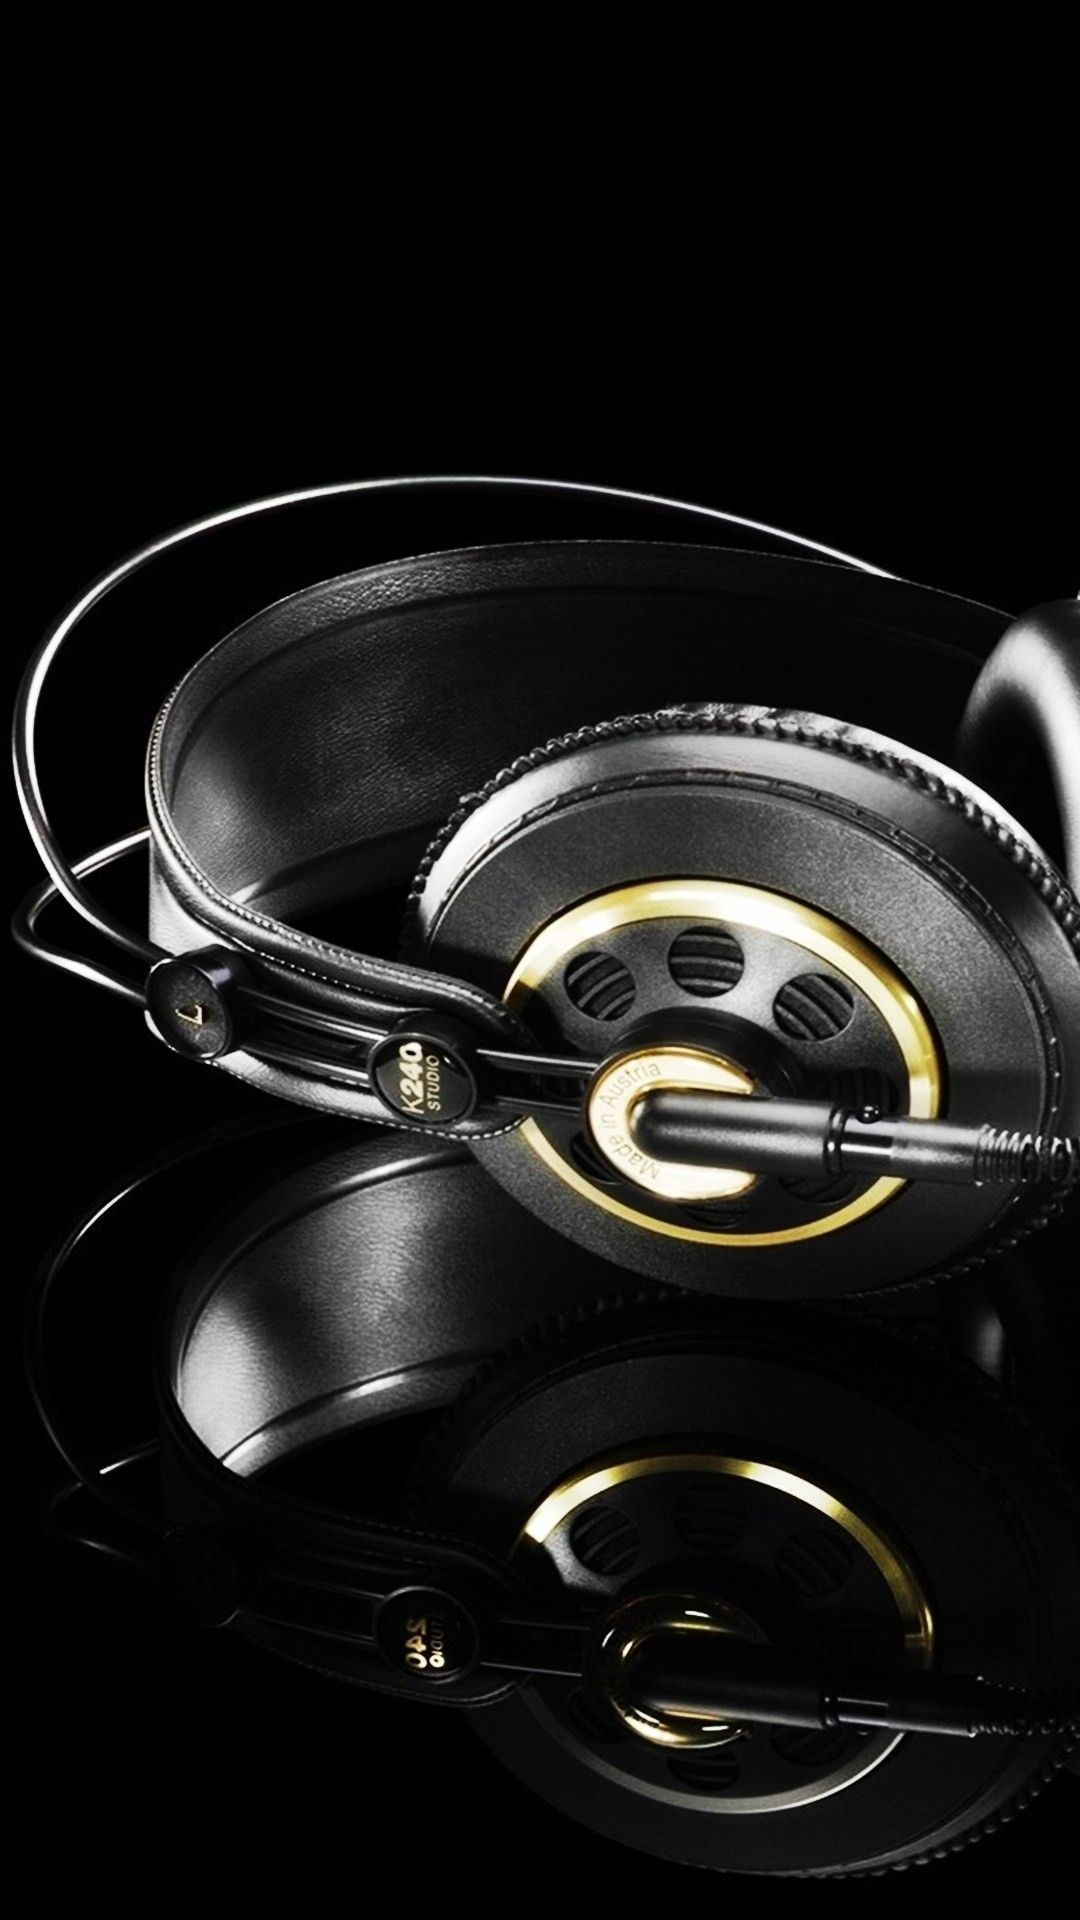 Studio Headphones Black Gold iPhone 6 plus wallpaper